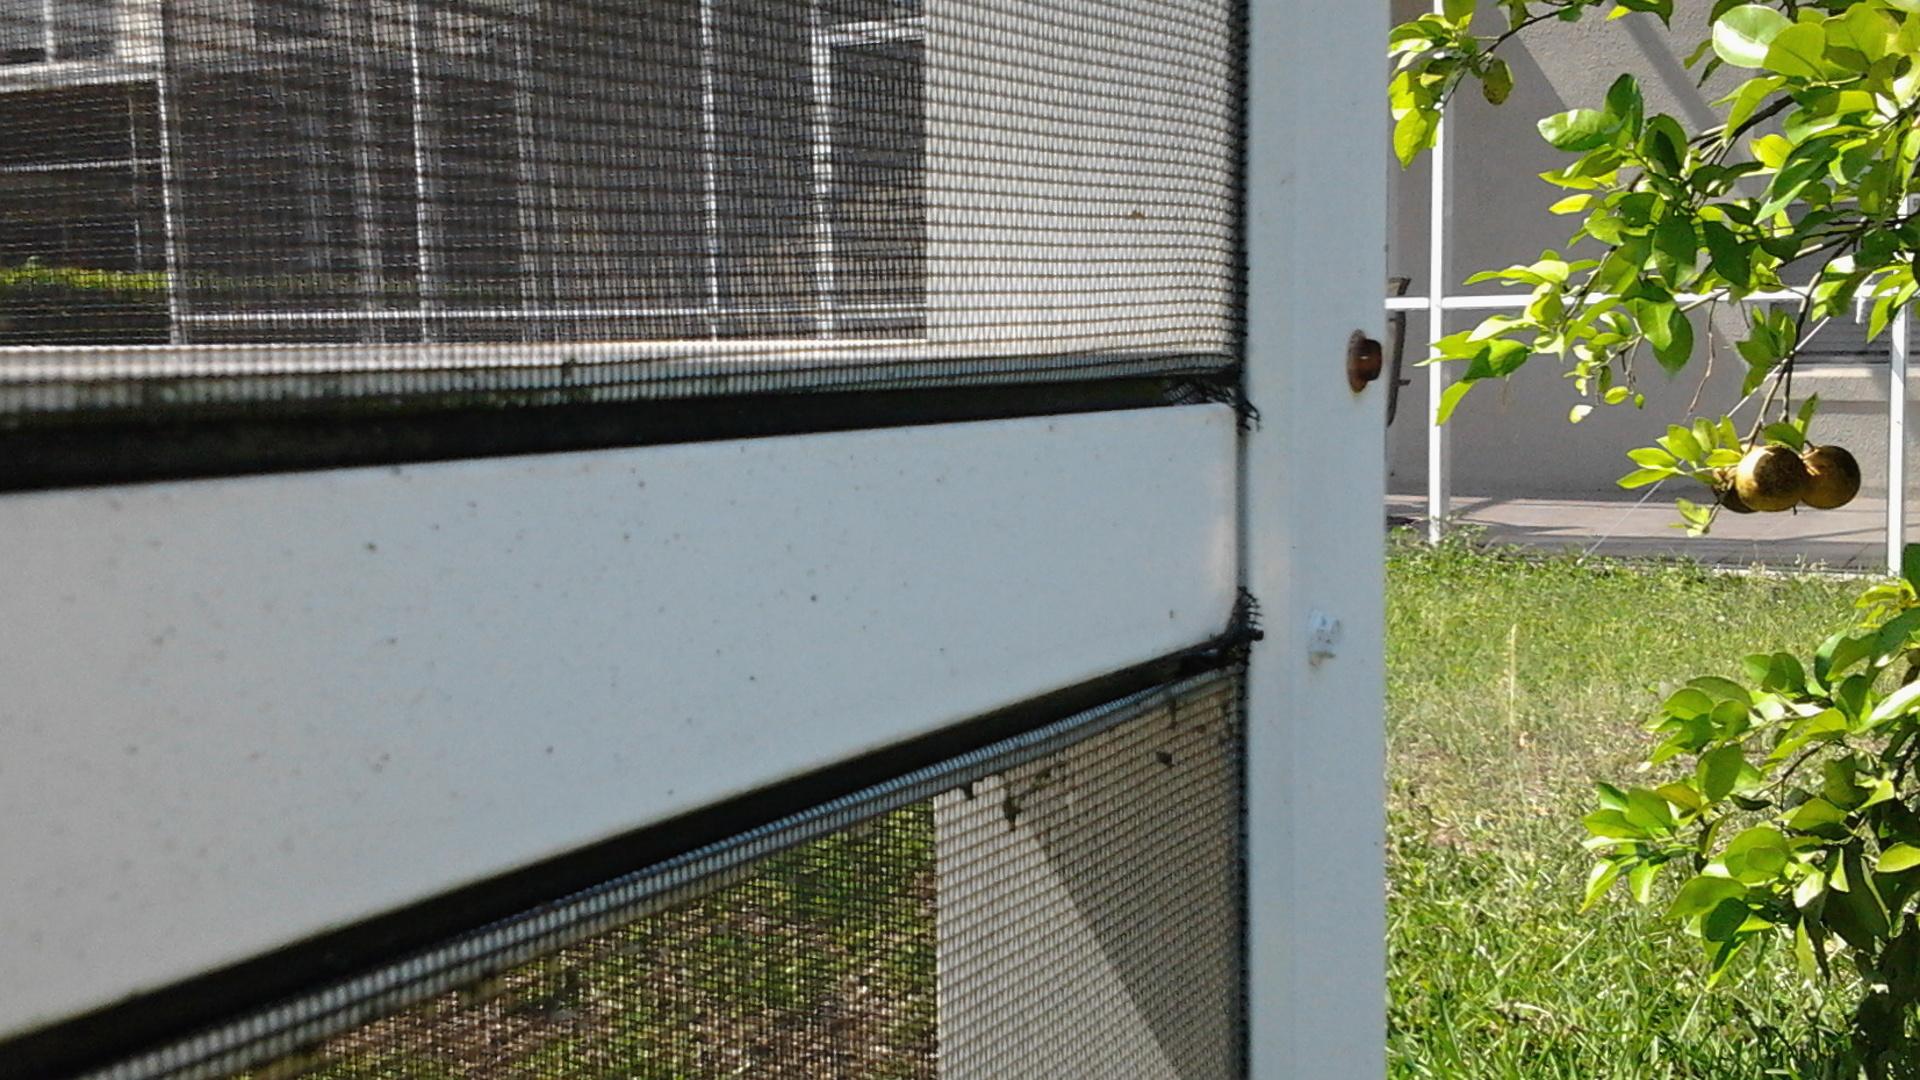 i do that screen repair torpoint rd winter garden pressure